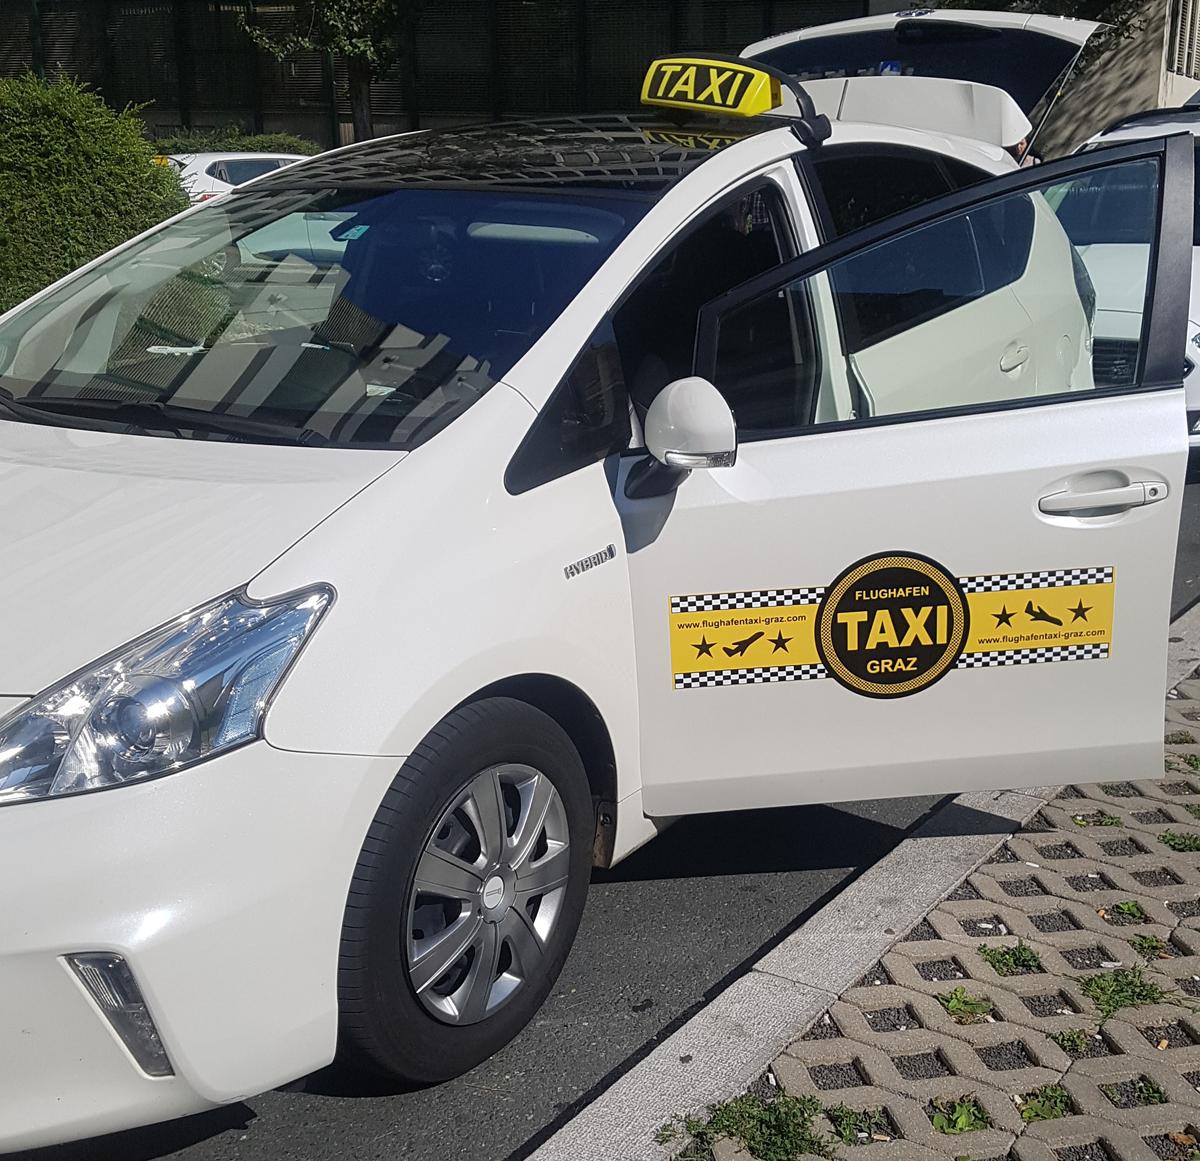 Такси в Граце